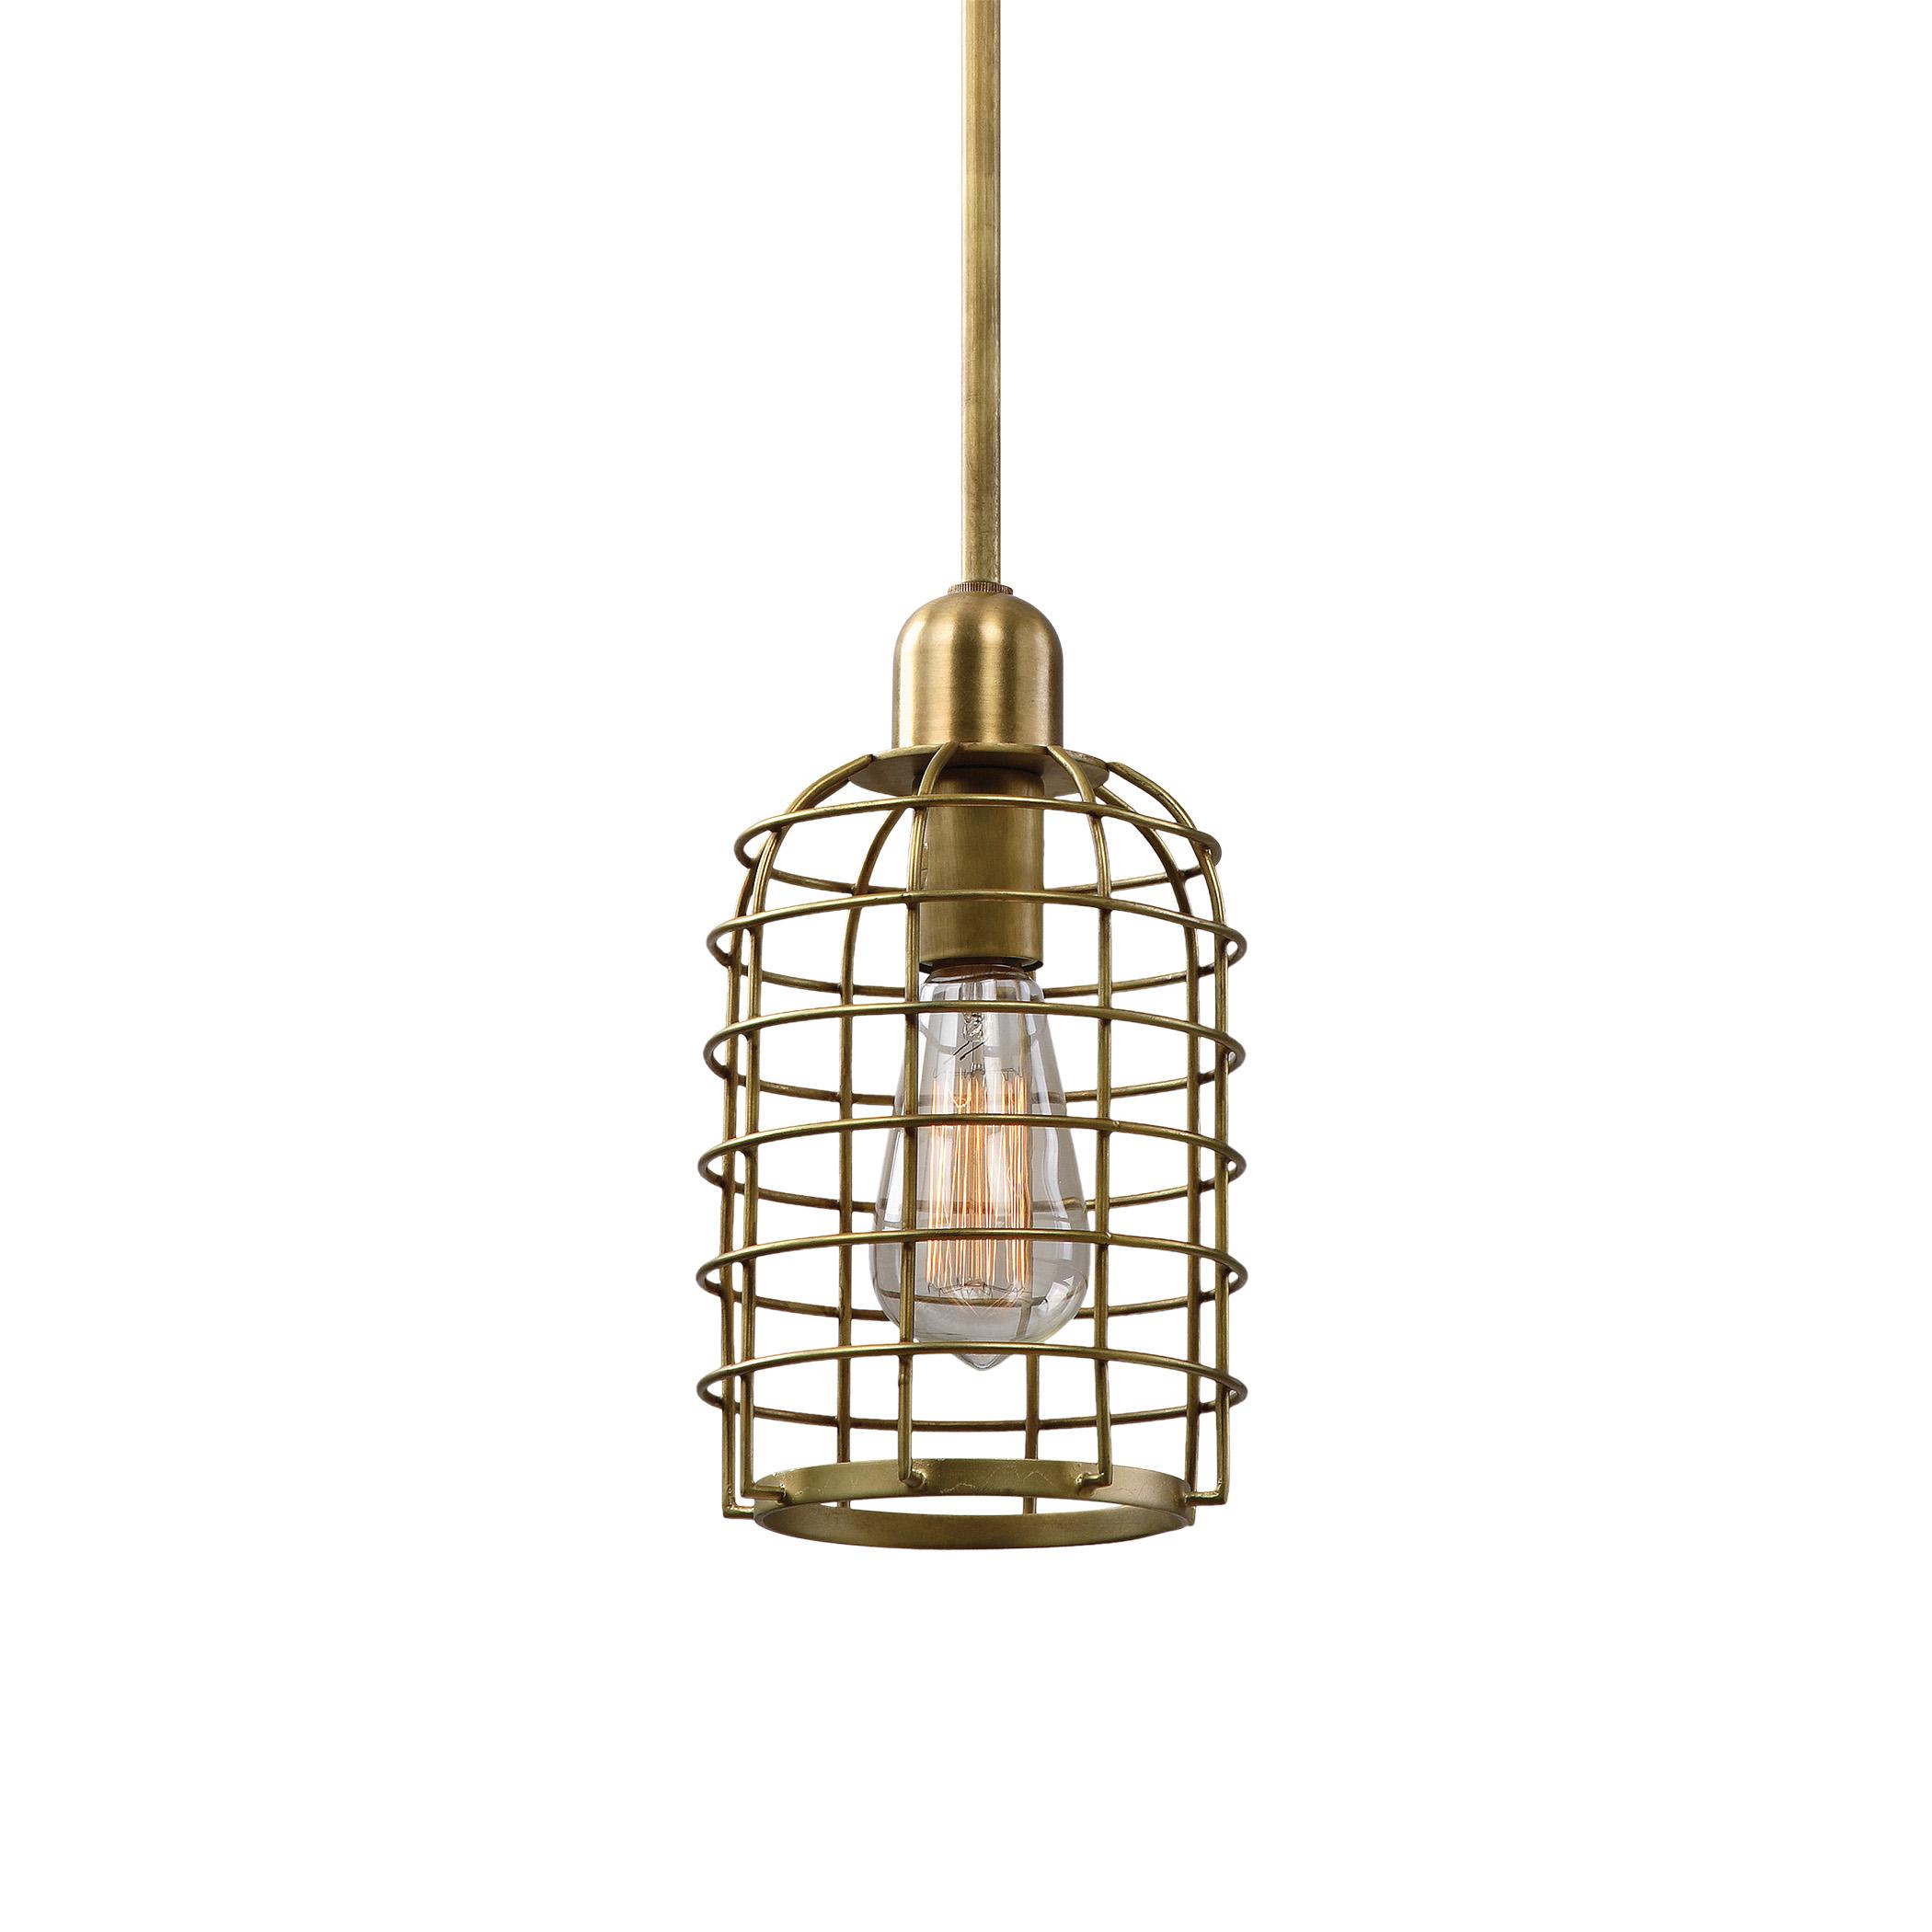 Uttermost Lighting Fixtures Septa 1 Light Cage Mini Pendant - Item Number: 22070